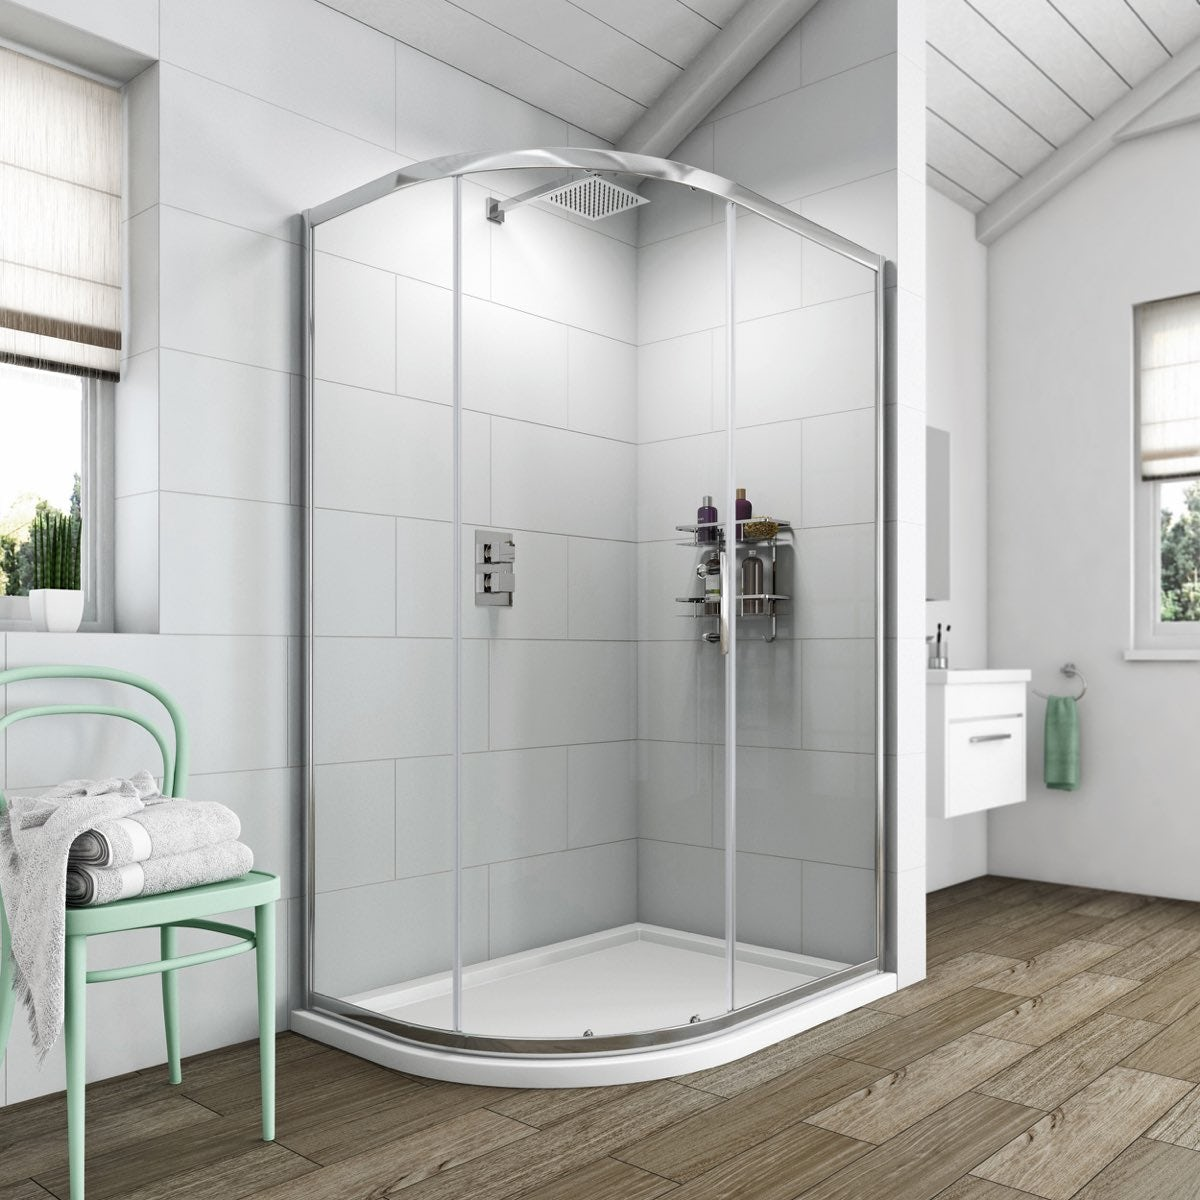 Clarity 6mm Single Door Offset Quadrant Shower Enclosure